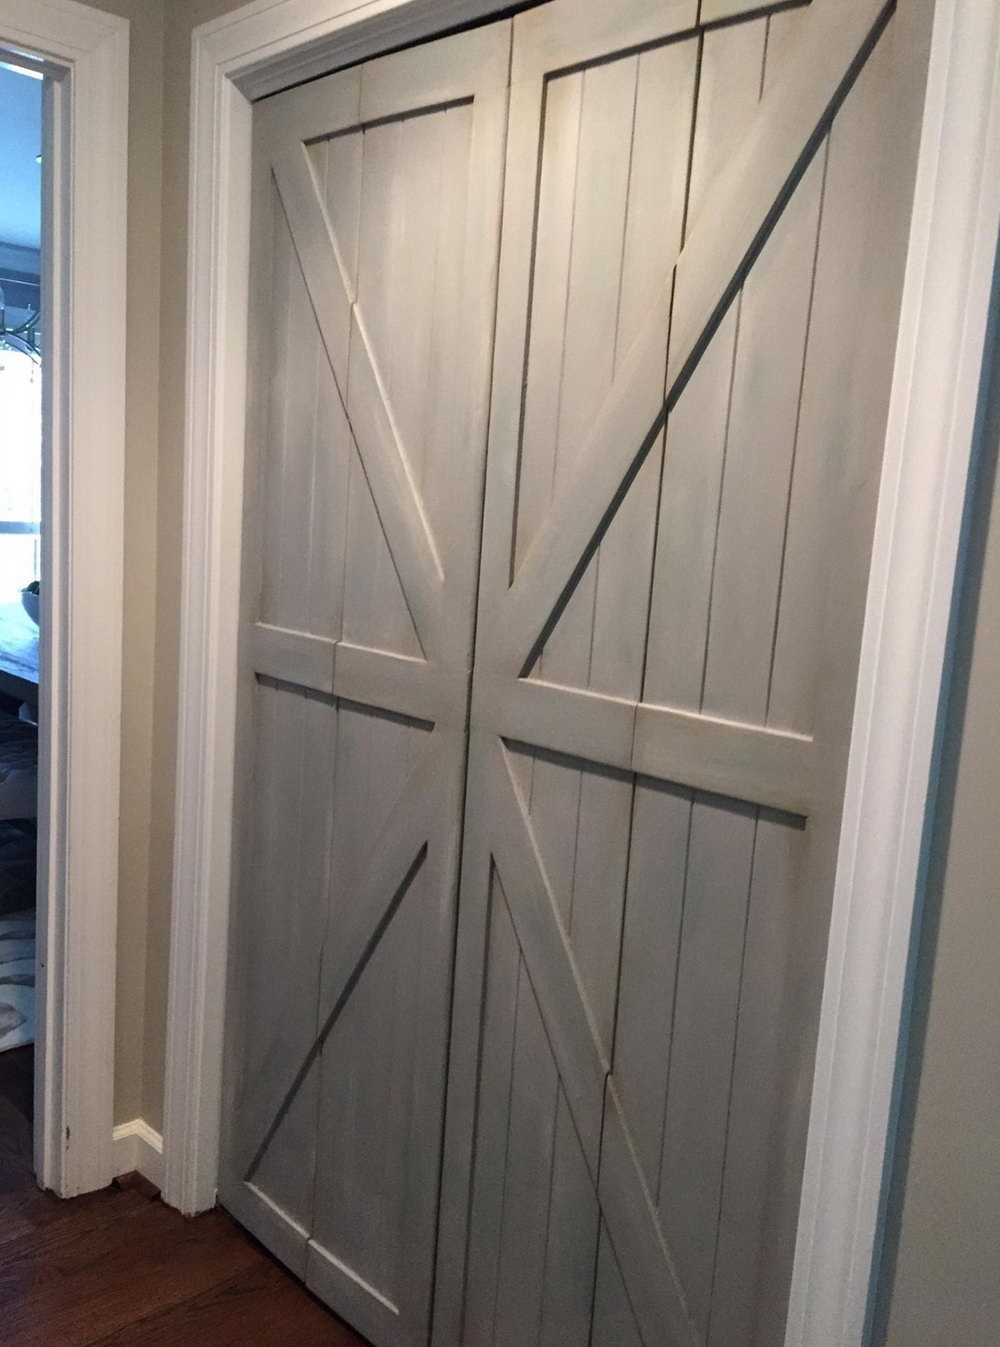 Replacing Closet Doors With Barn Doors